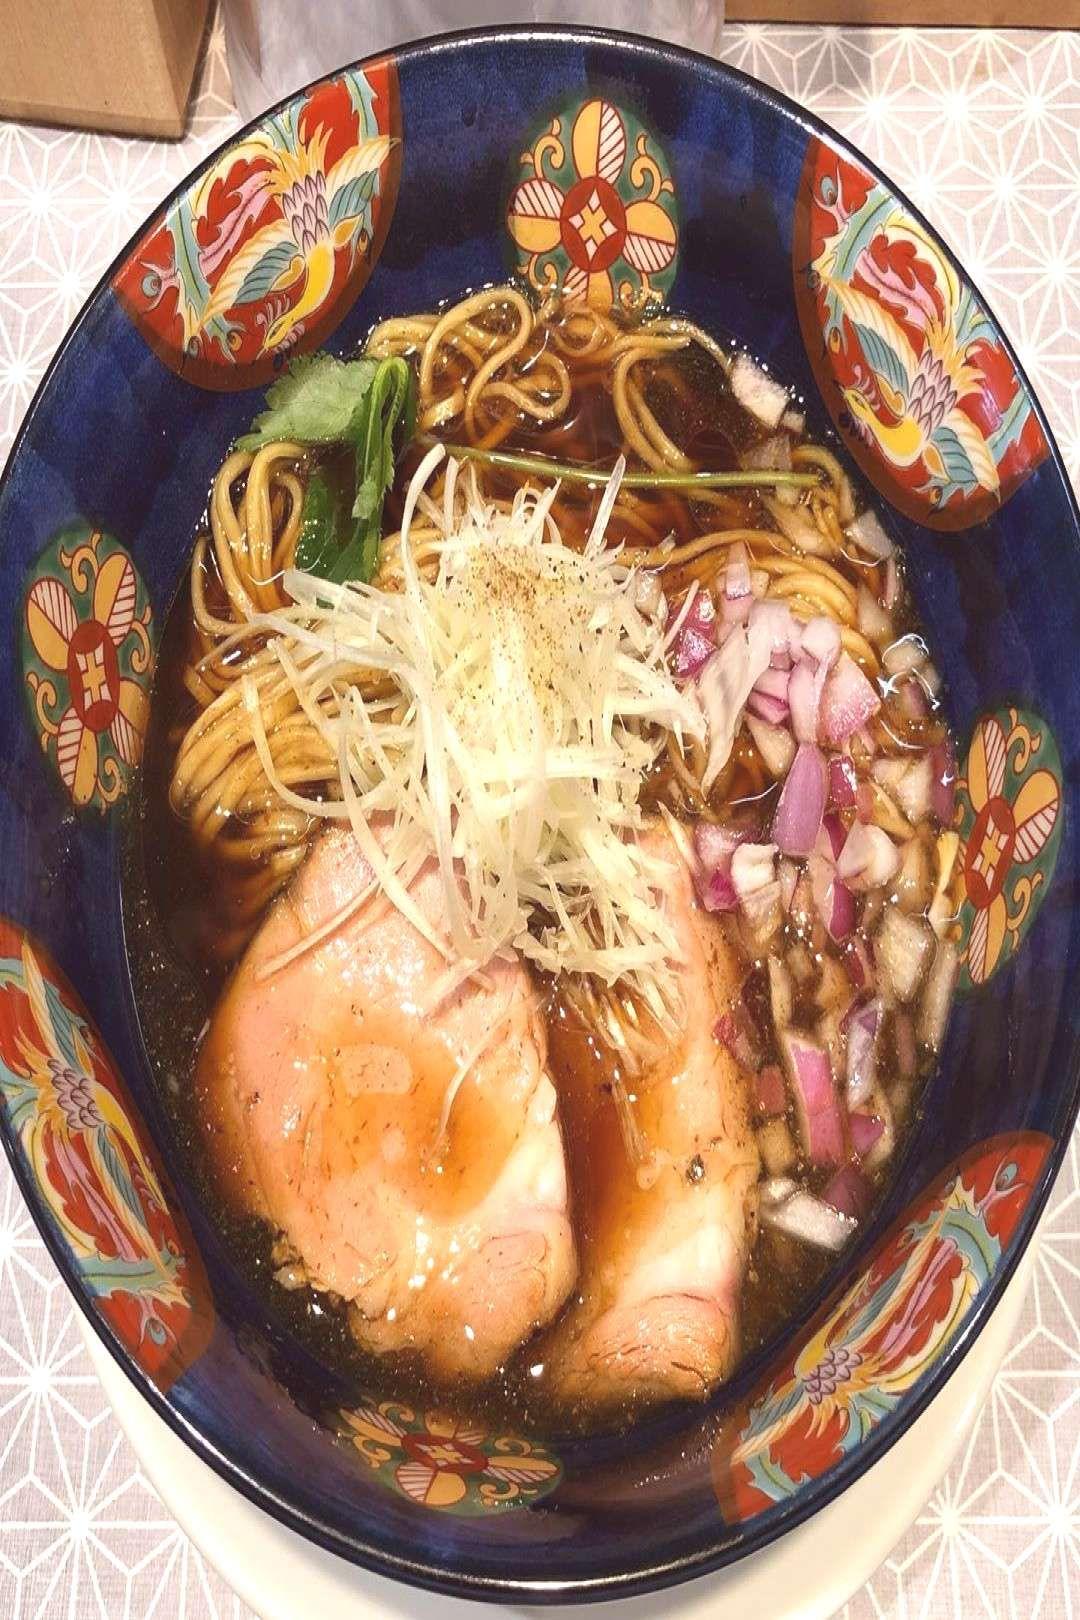 #indoor #ramen #food #and #ramen #ラーメン #中華そばのむら #のむらの中華You can find Ramen noodles and more on our website.#ramen #ラーメン #中華そばのむら #のむらの中華